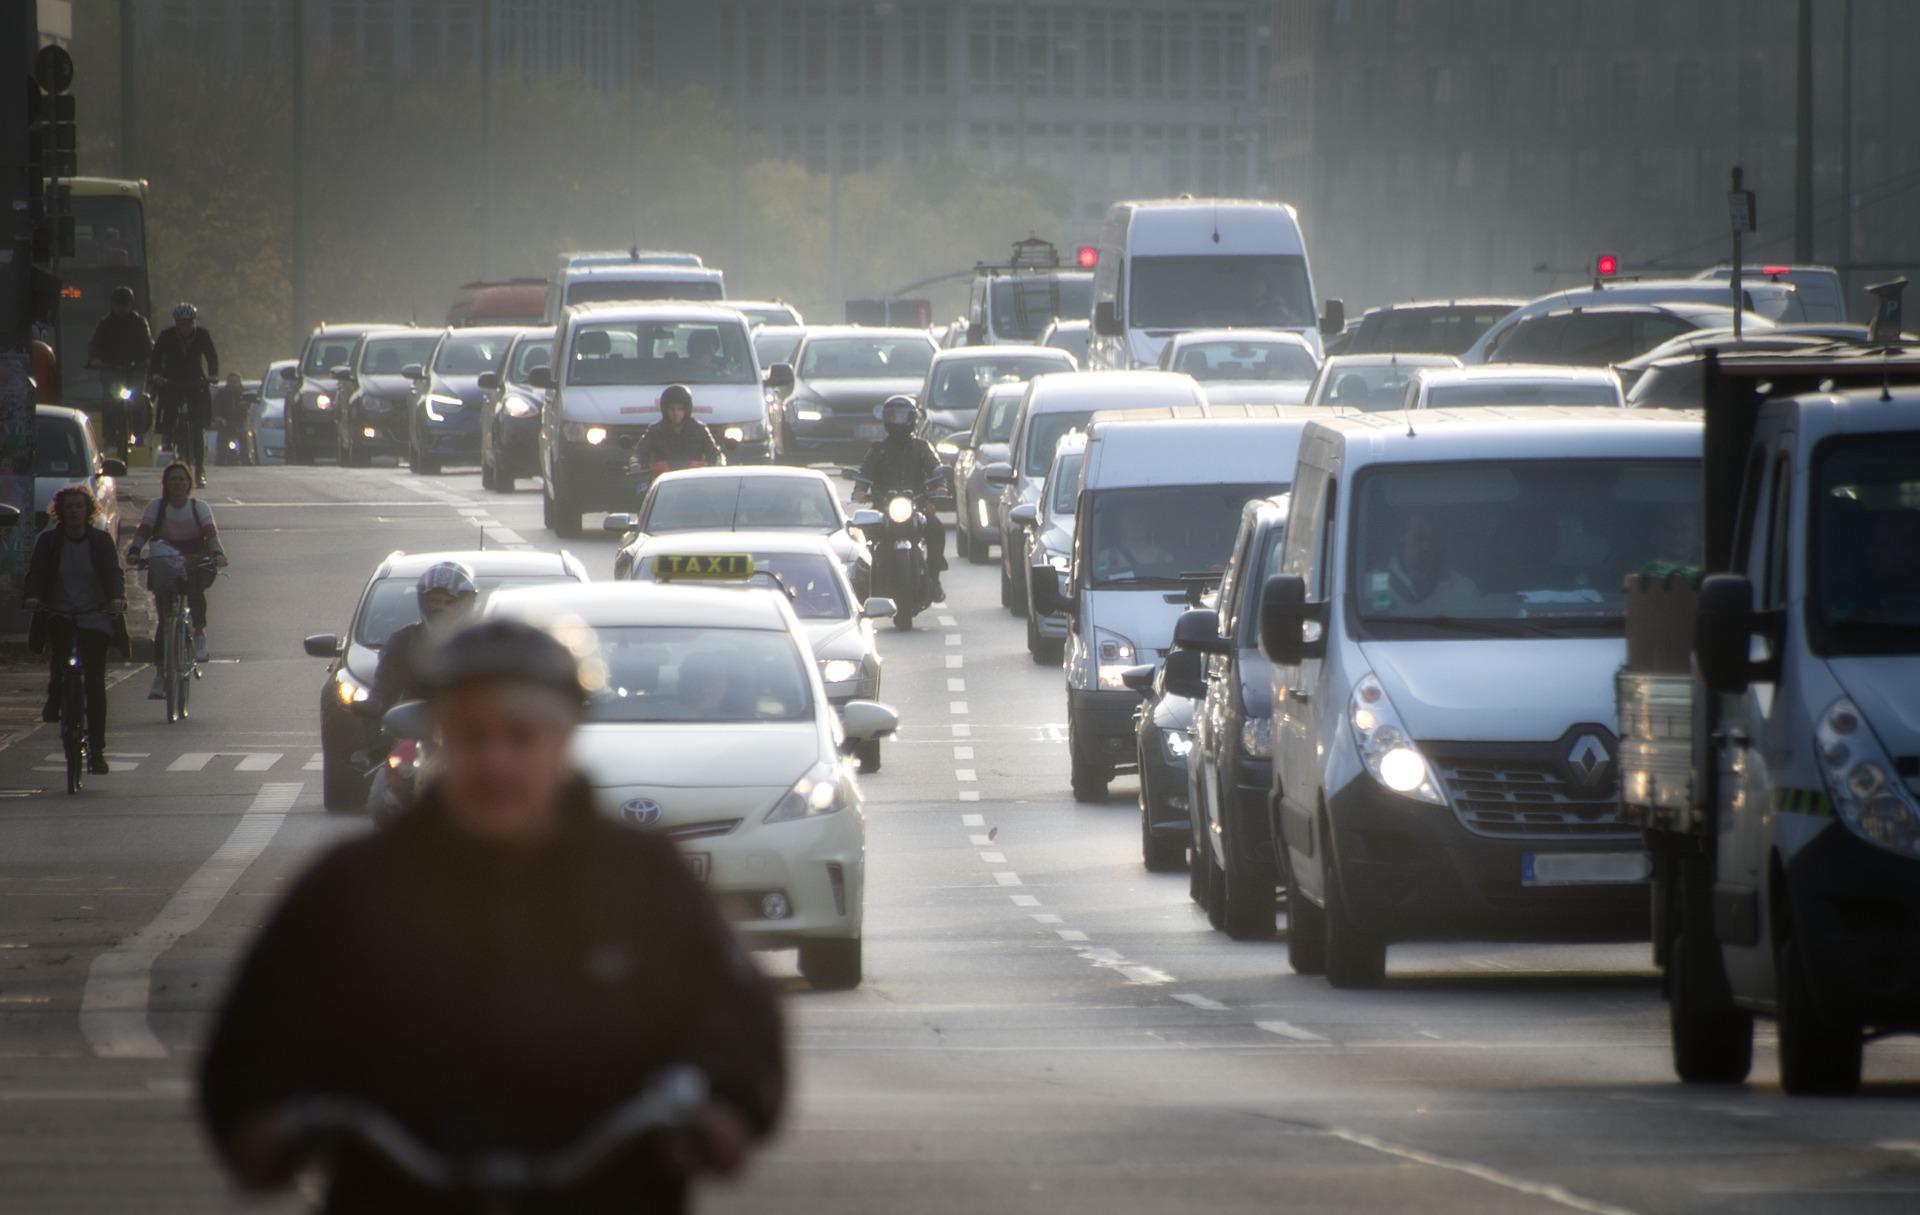 Diesel fahrverbot aufgehoben